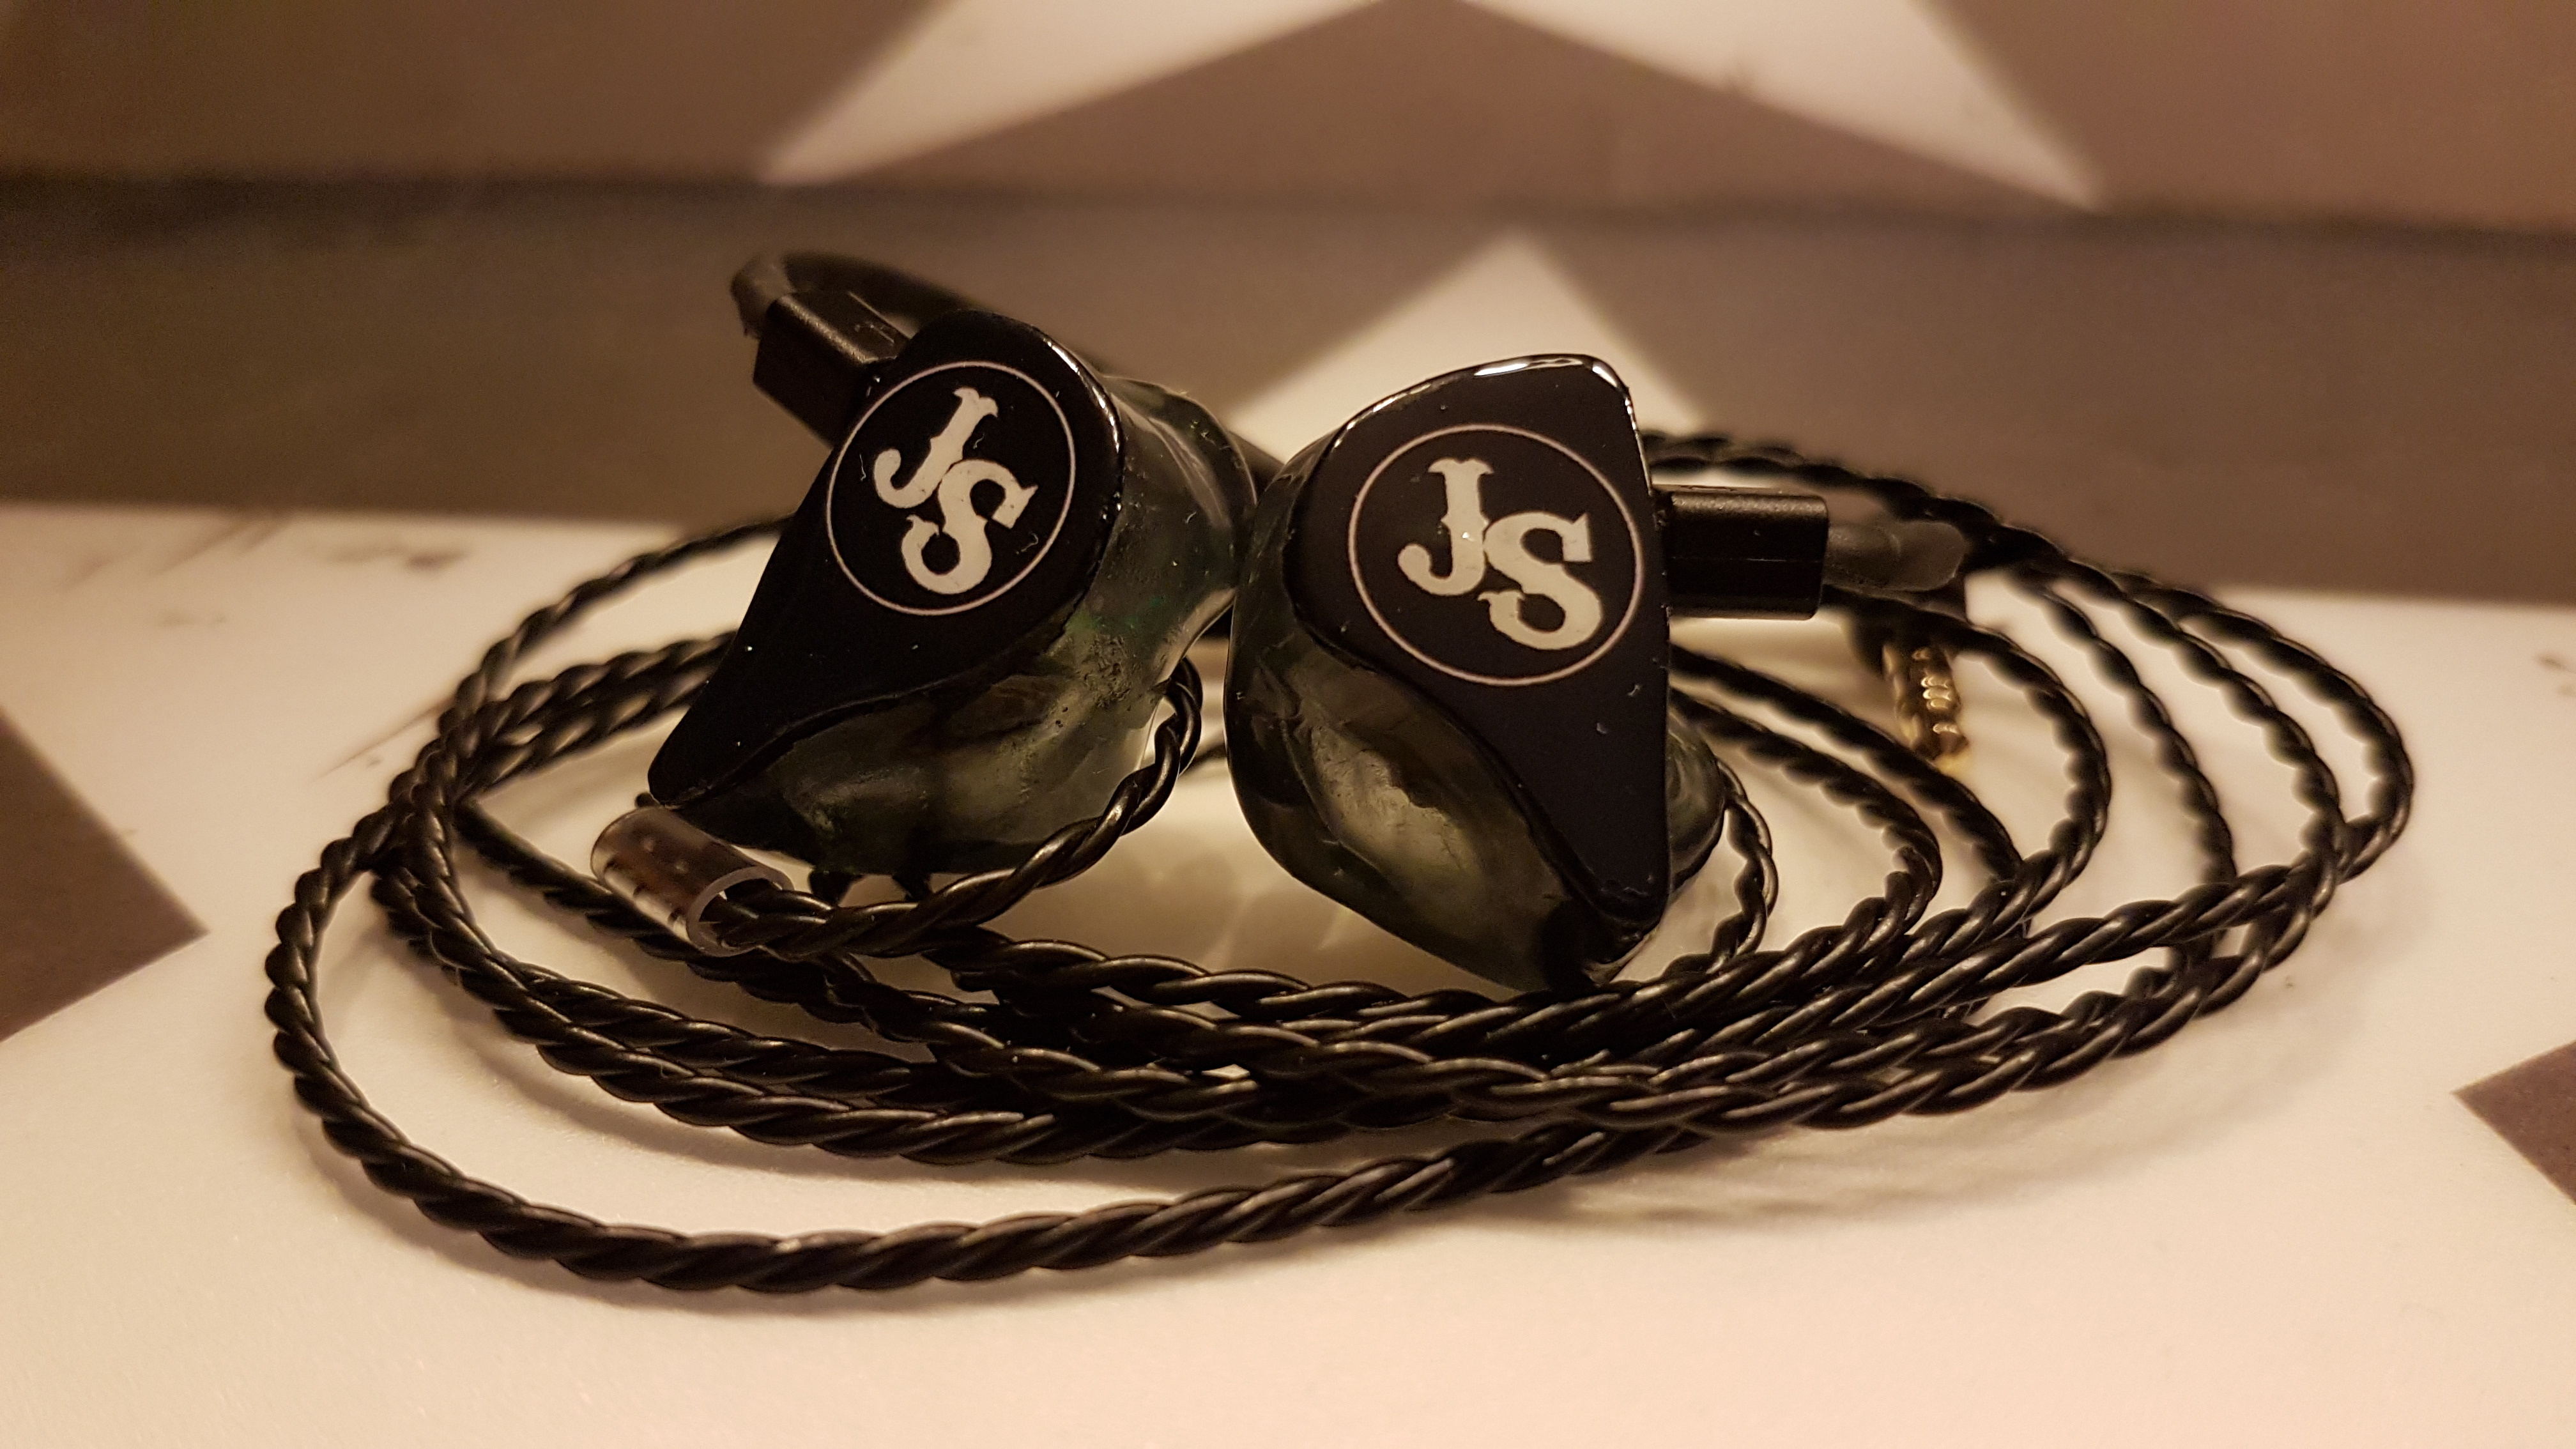 Jack Stoned - Blessed Hellride